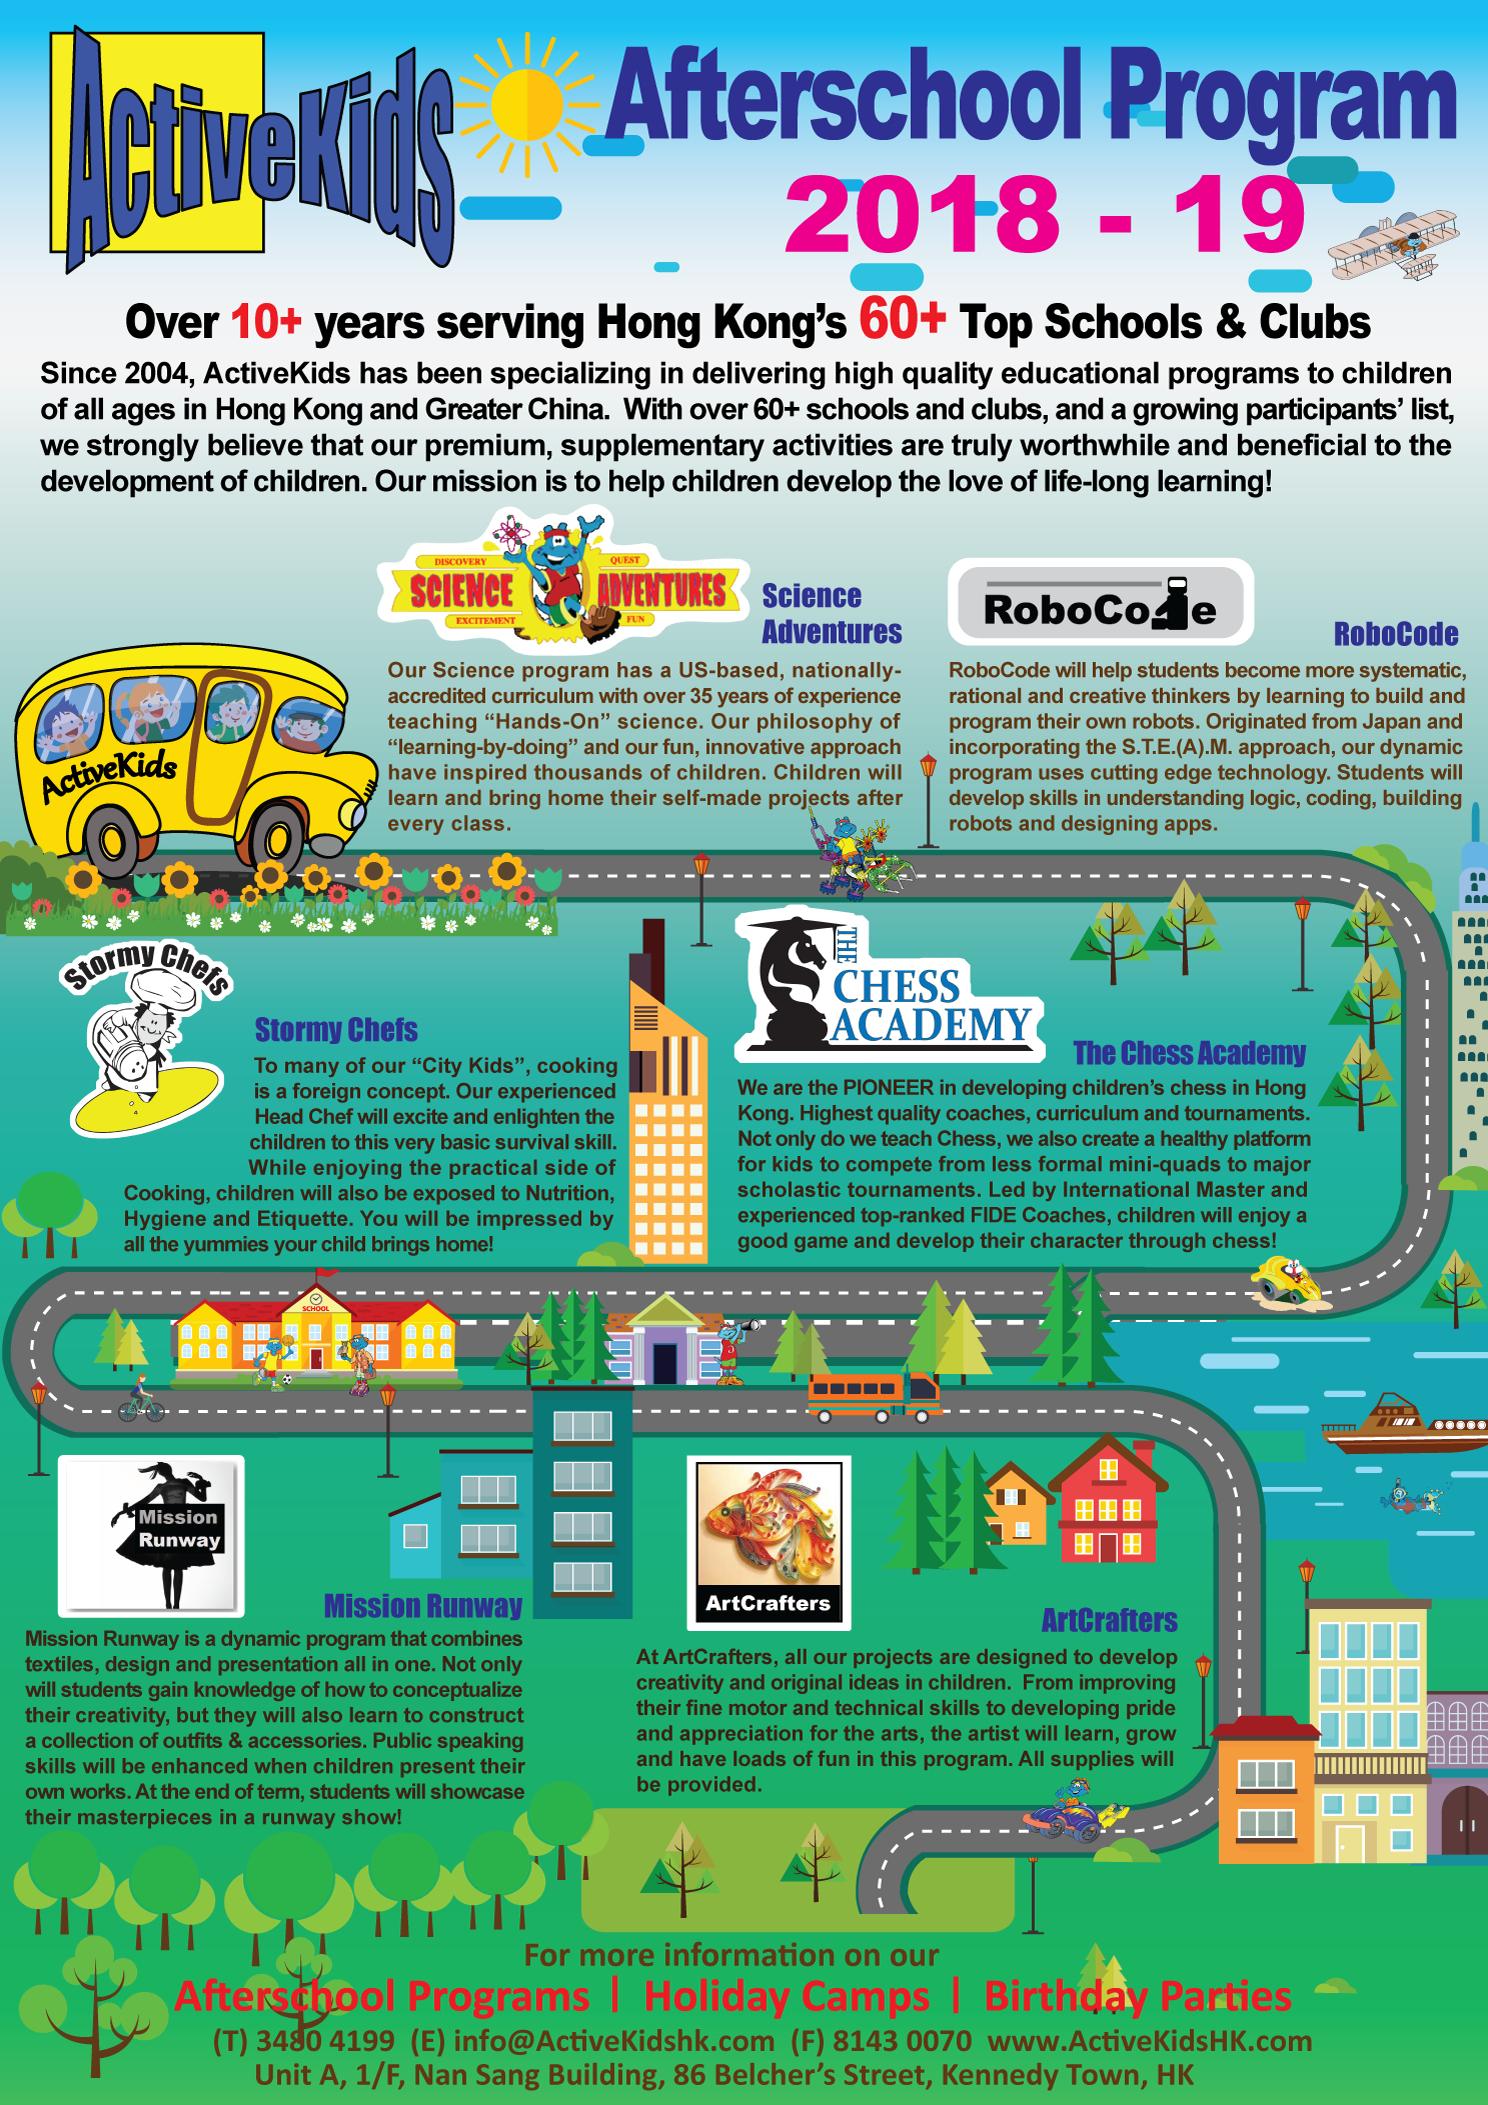 10 Stunning Ideas For After School Programs activekids science adventures afterschool programs